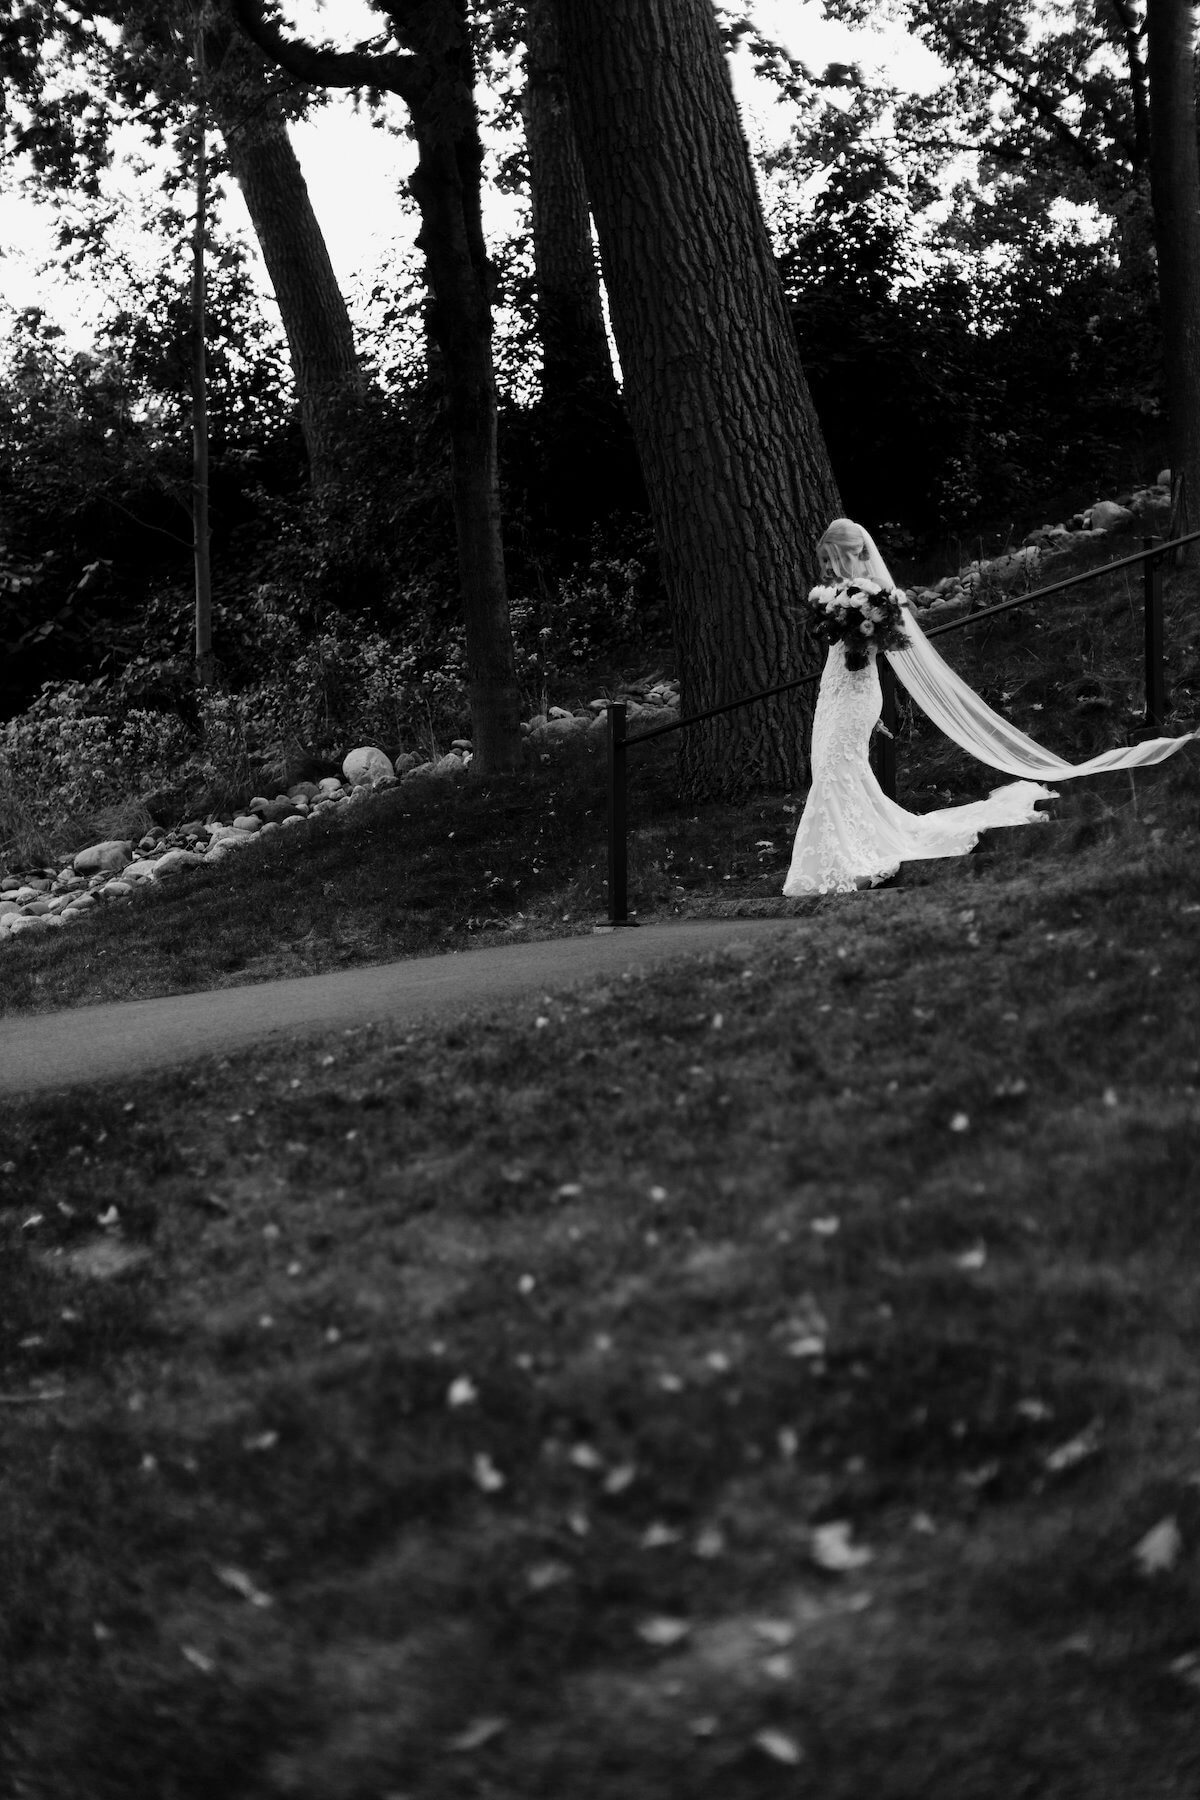 engle-olson-april-cj-wedding-jessica-holleque-8.jpg